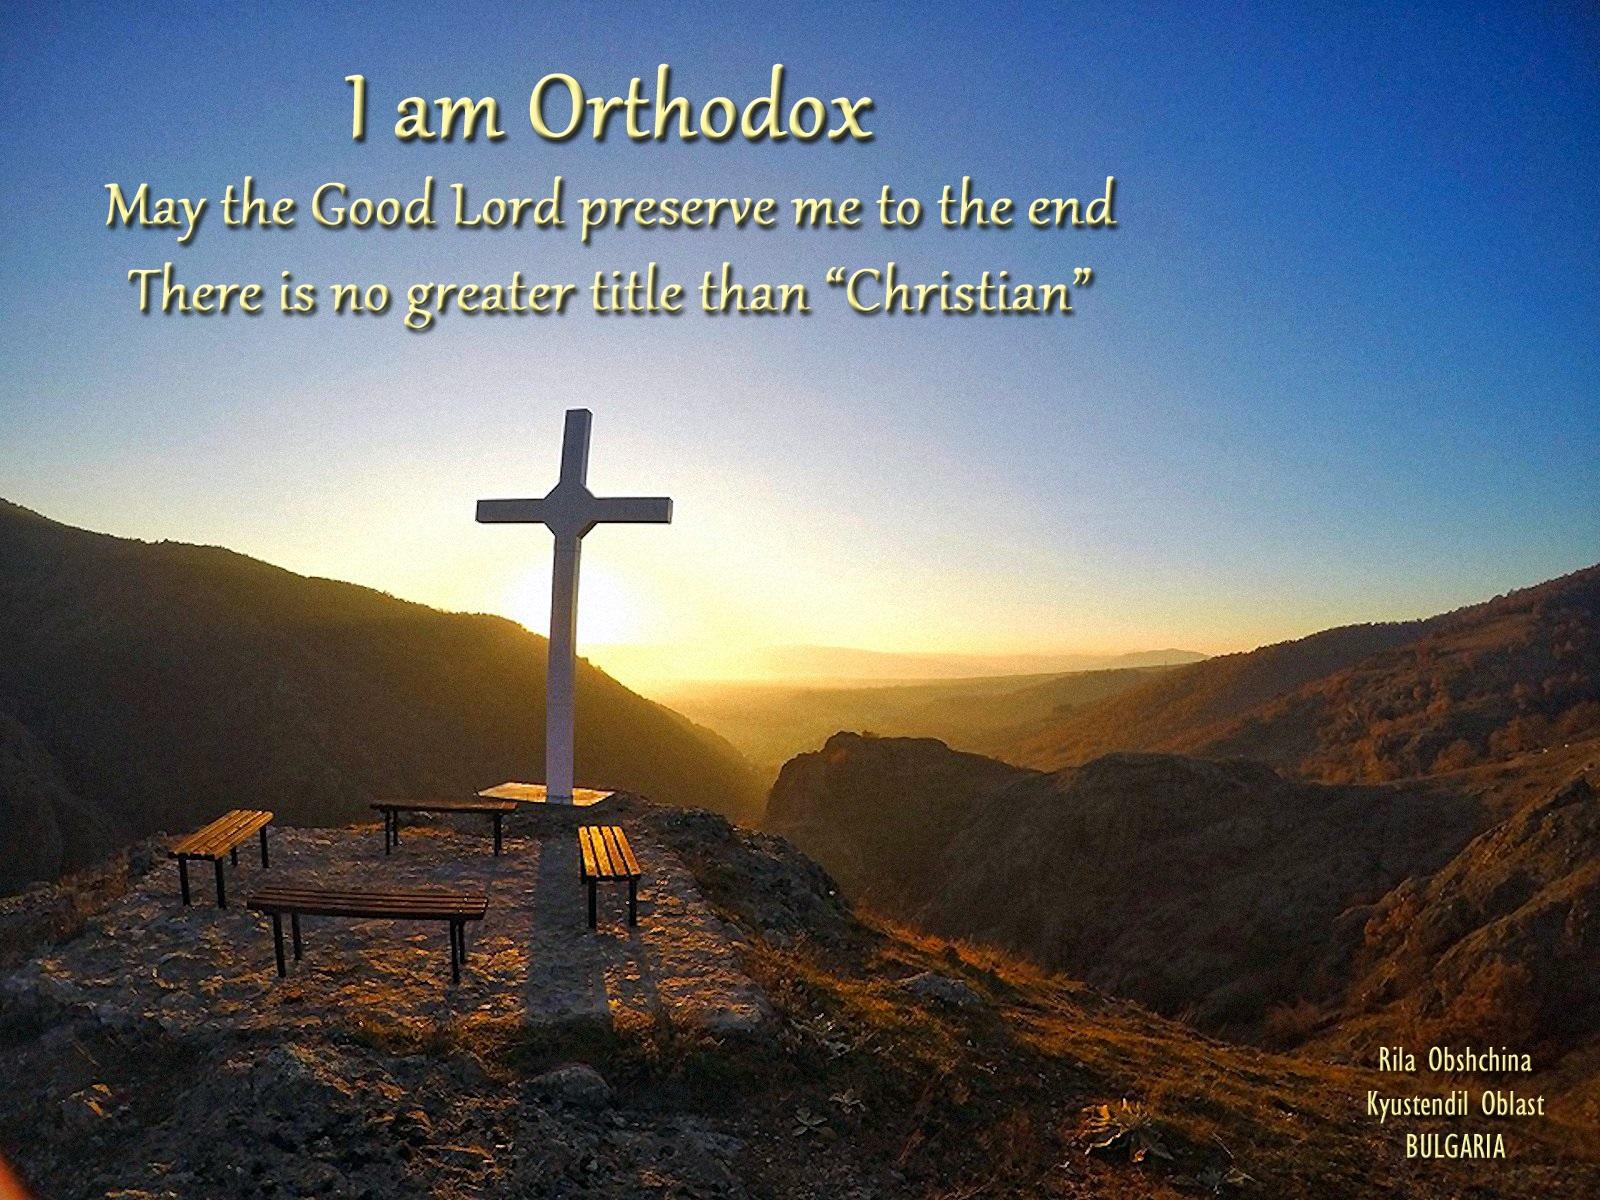 00 I am Orthodox 150316